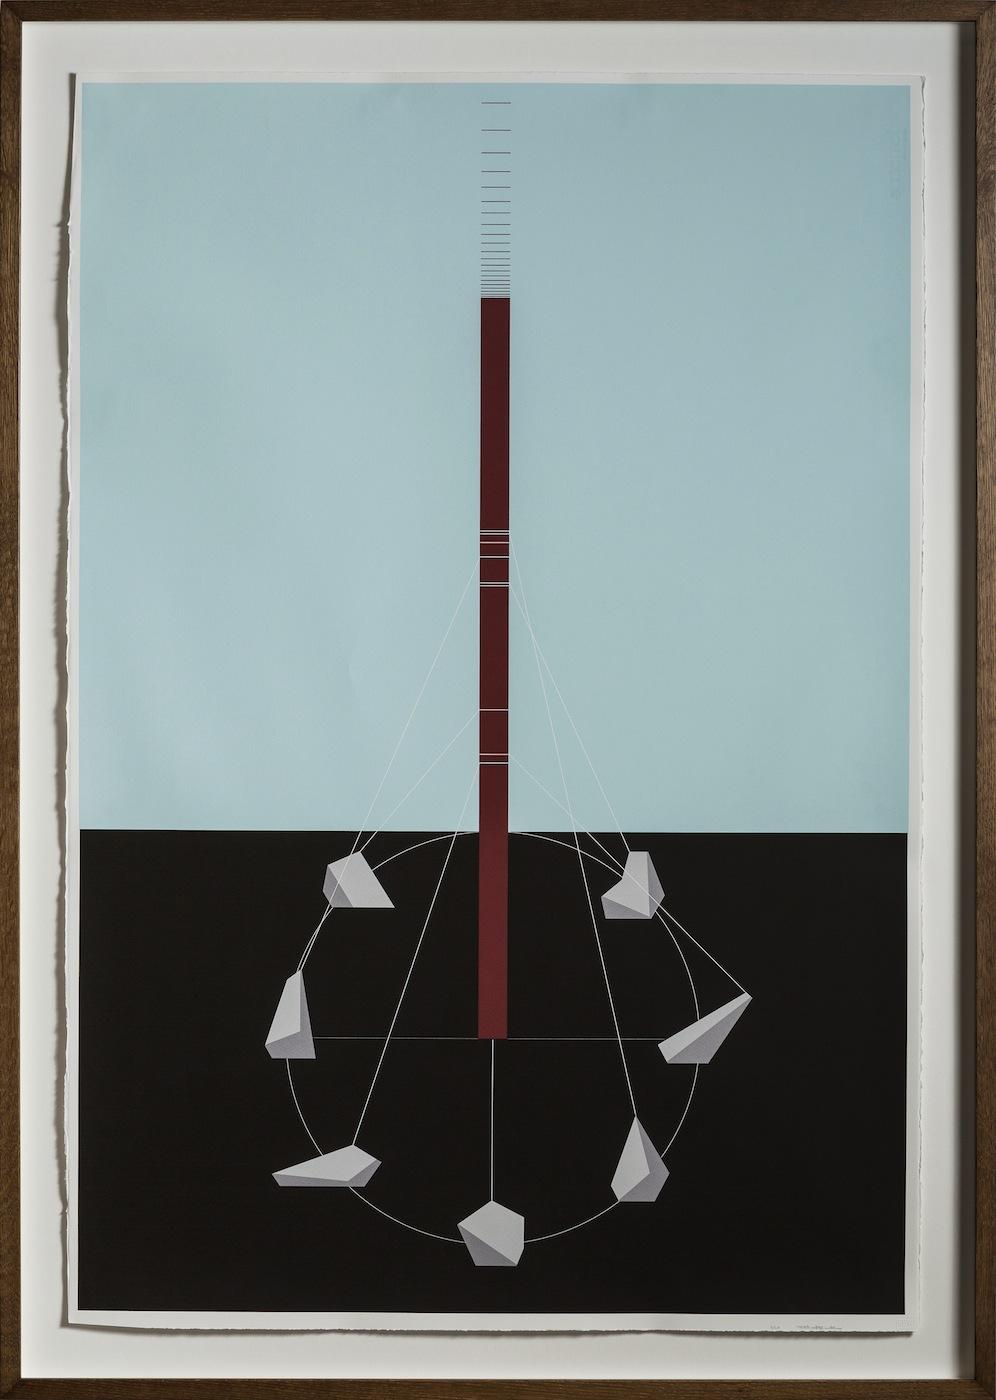 Ancestor's Circle 2013 Screen print on paper 112.5 x 76.5 cm Edition 20 + 1 AP